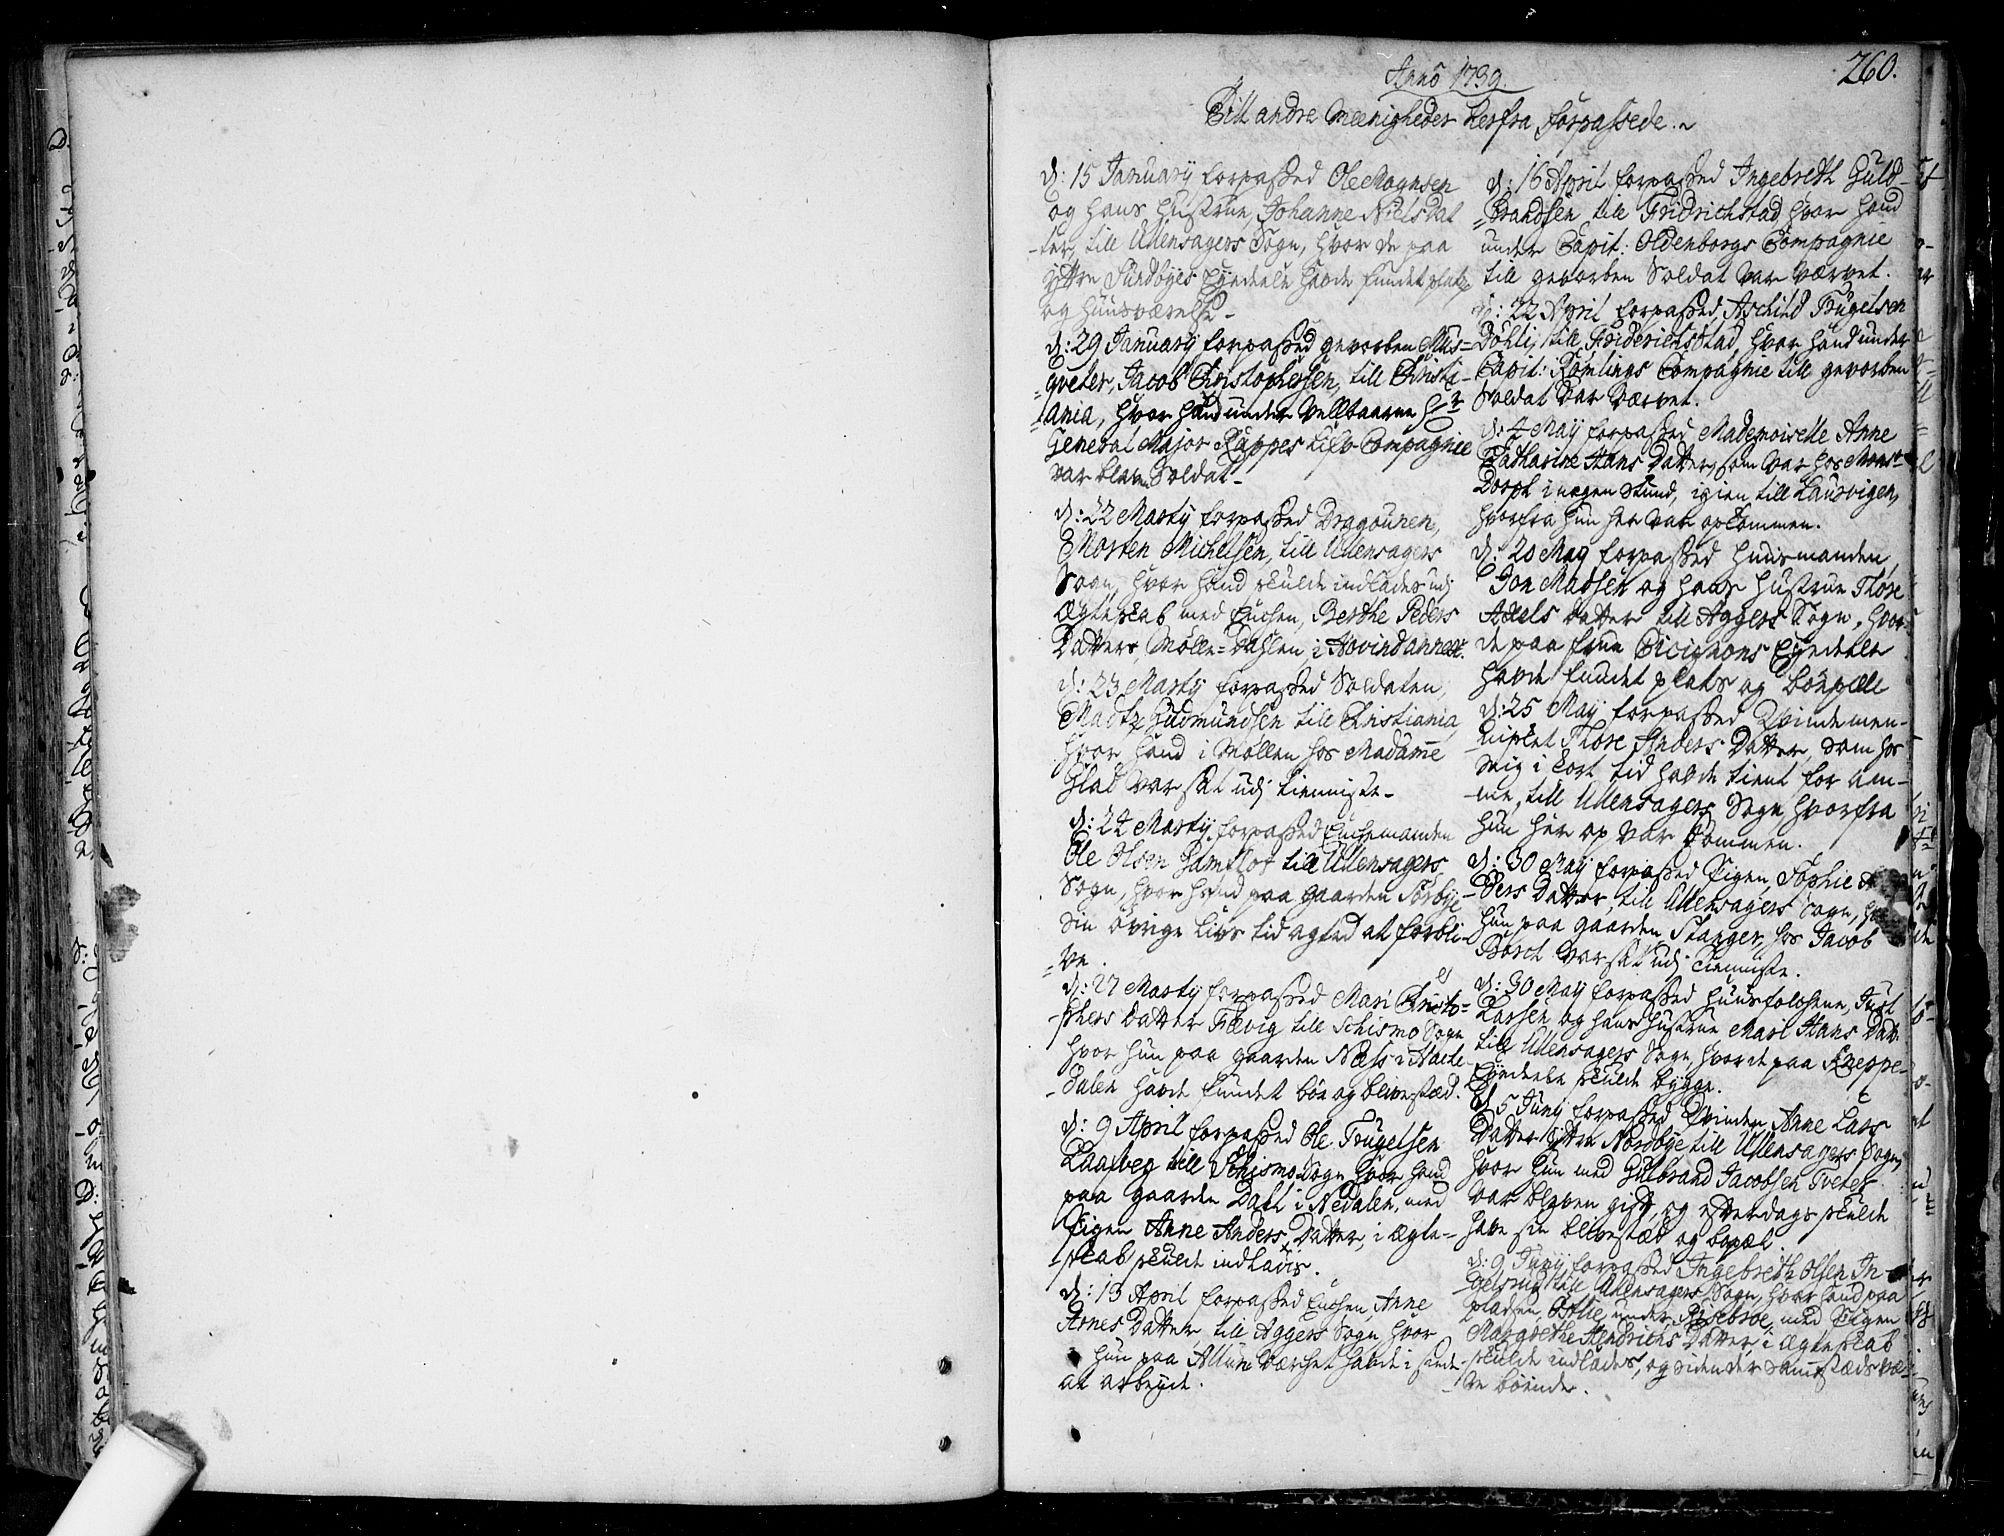 SAO, Nannestad prestekontor Kirkebøker, F/Fa/L0006: Ministerialbok nr. I 6, 1739-1754, s. 260